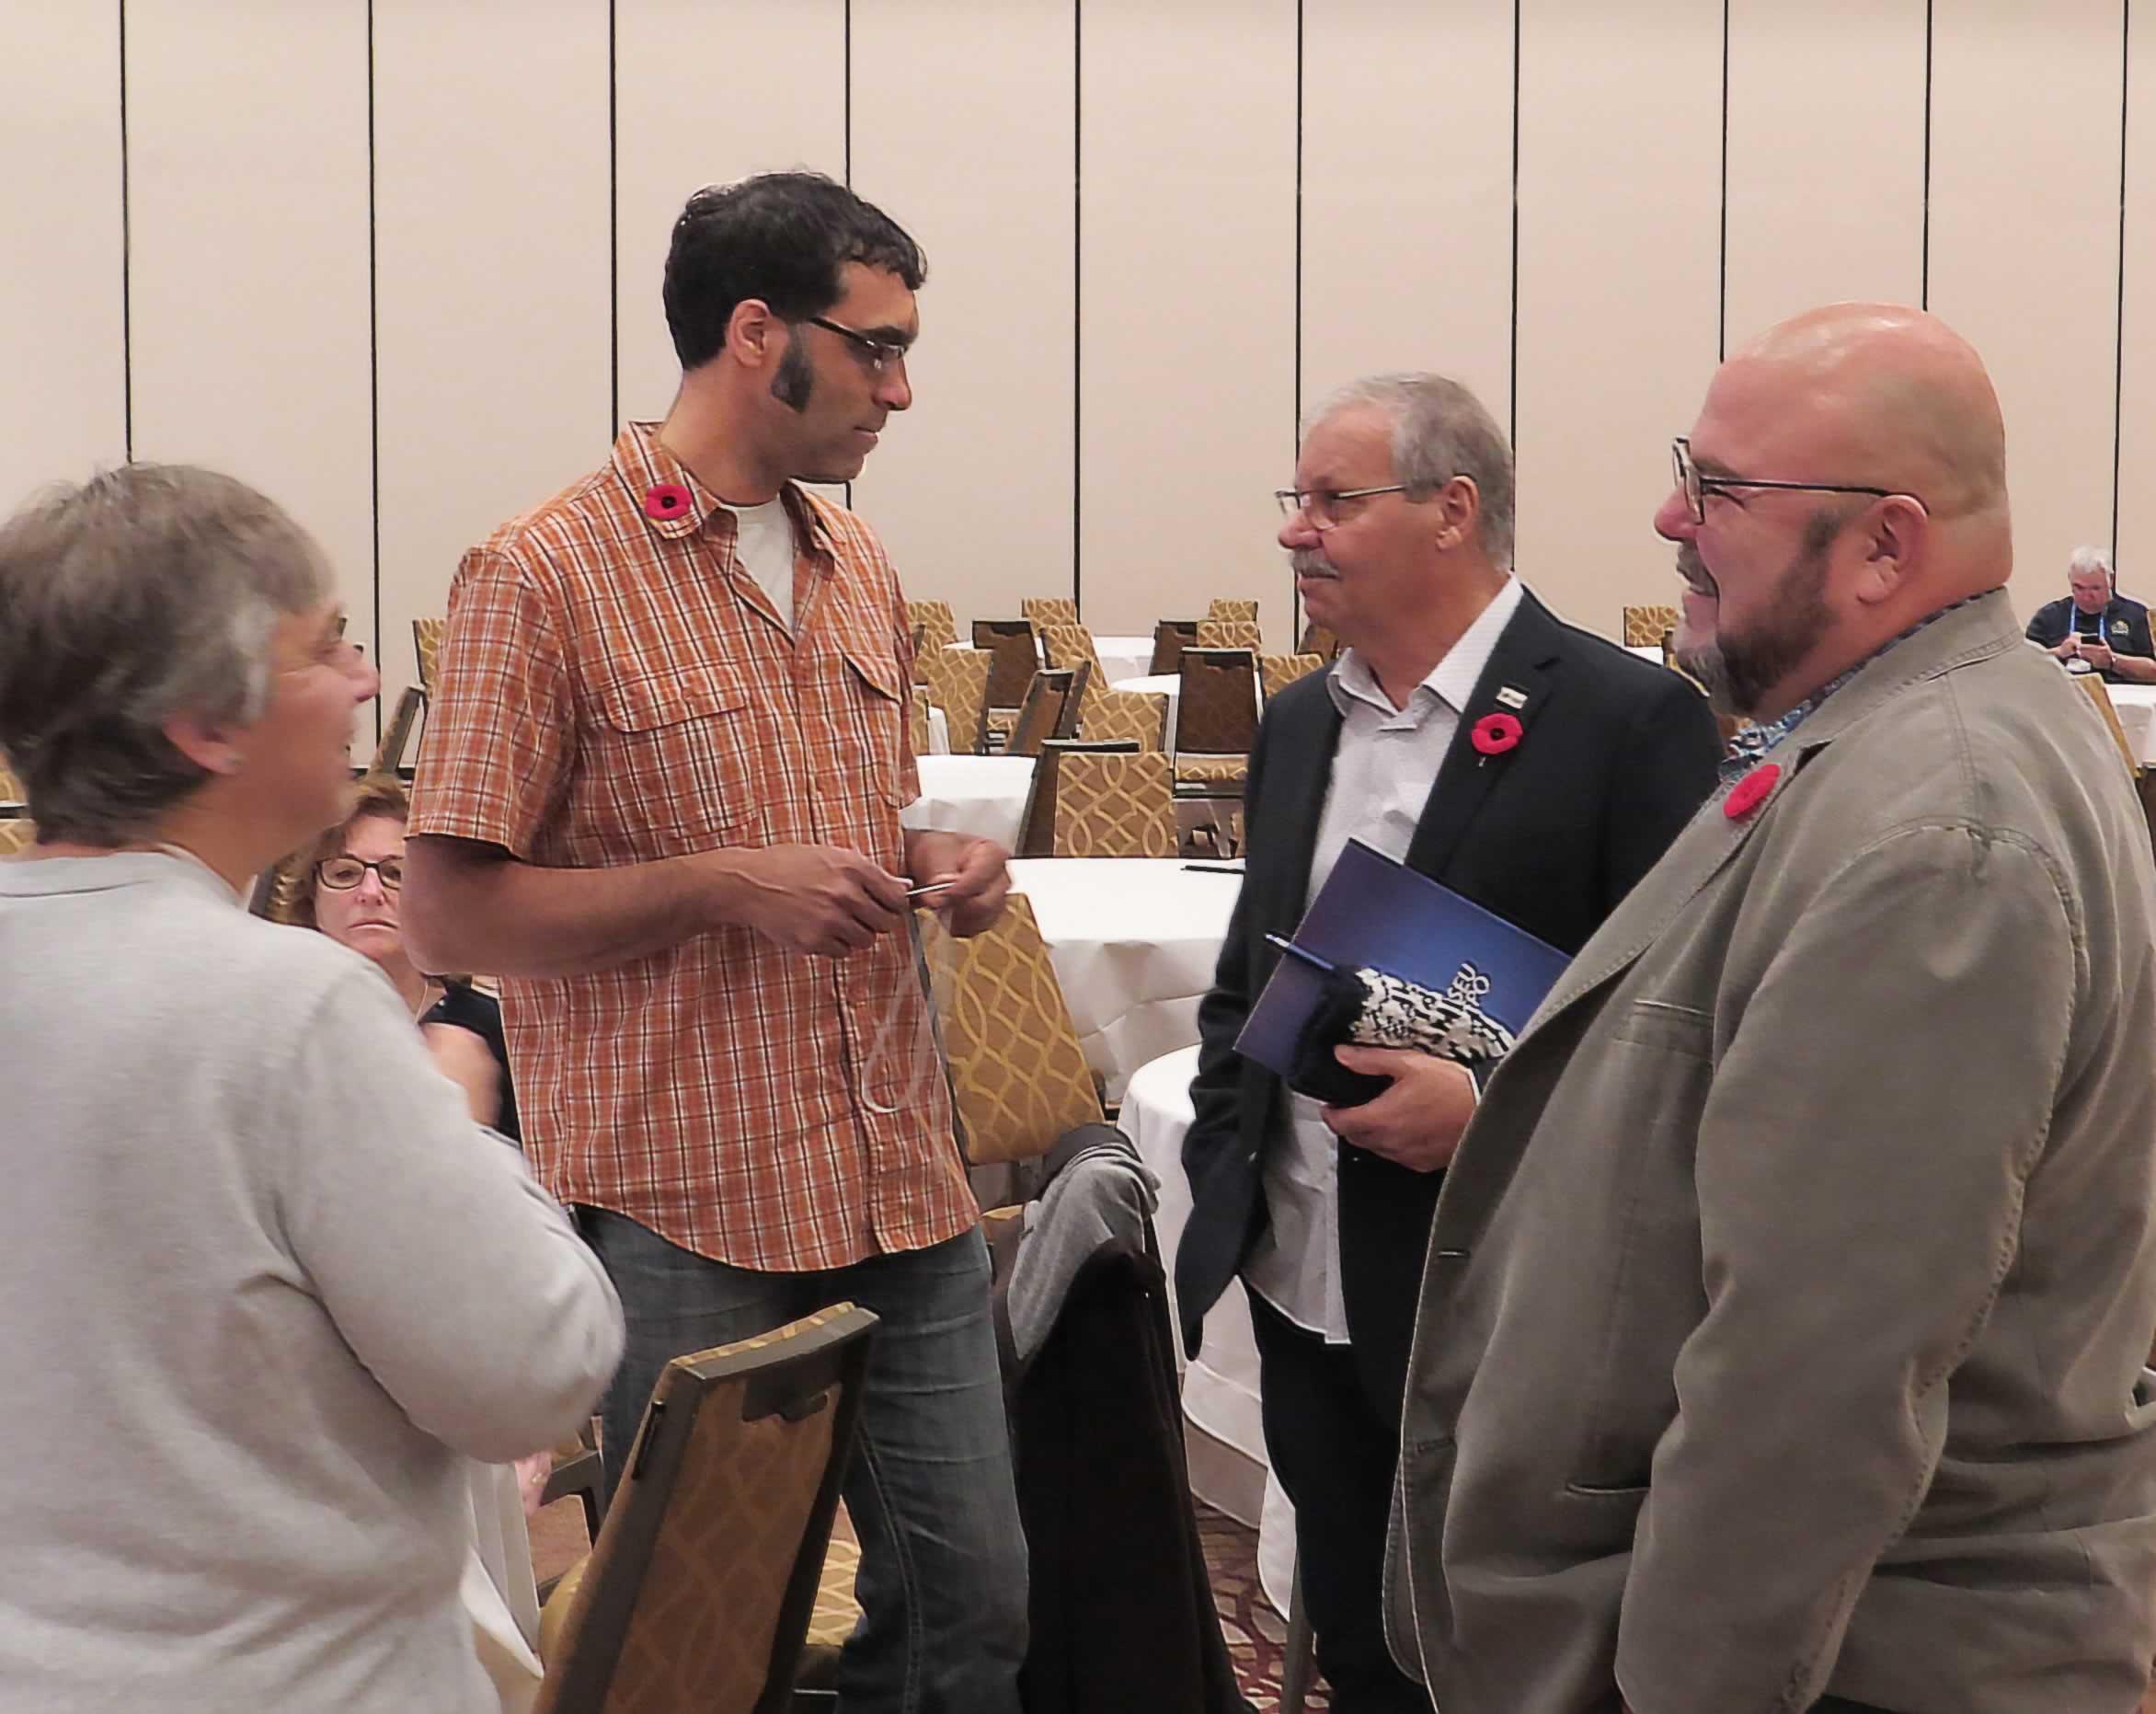 smokey_with_delegates.jpg